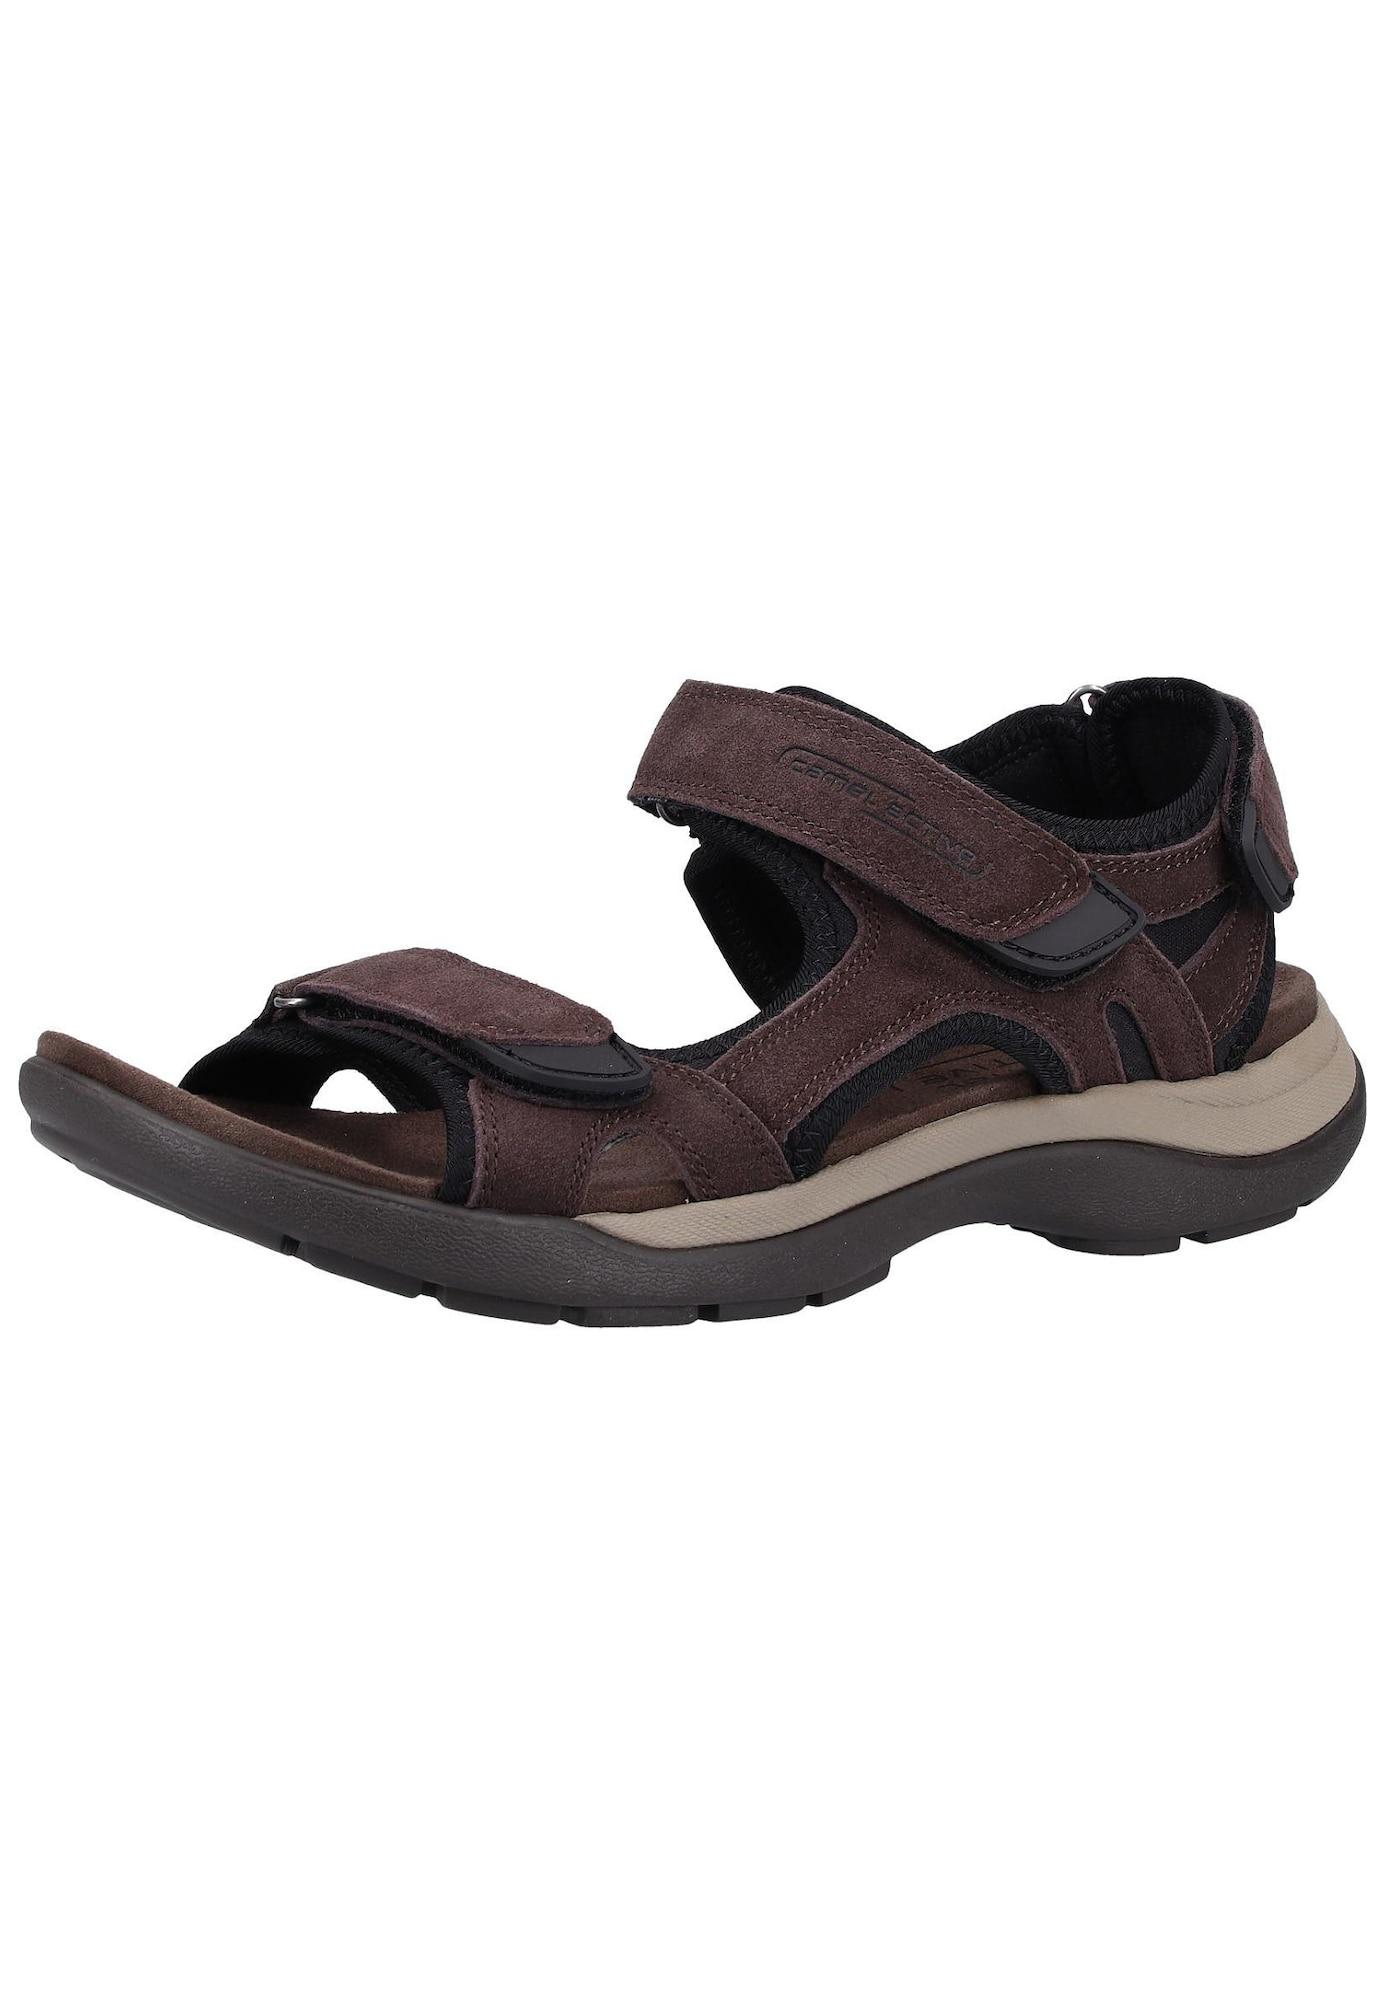 Sandalen   Schuhe > Sandalen & Zehentrenner   camel active